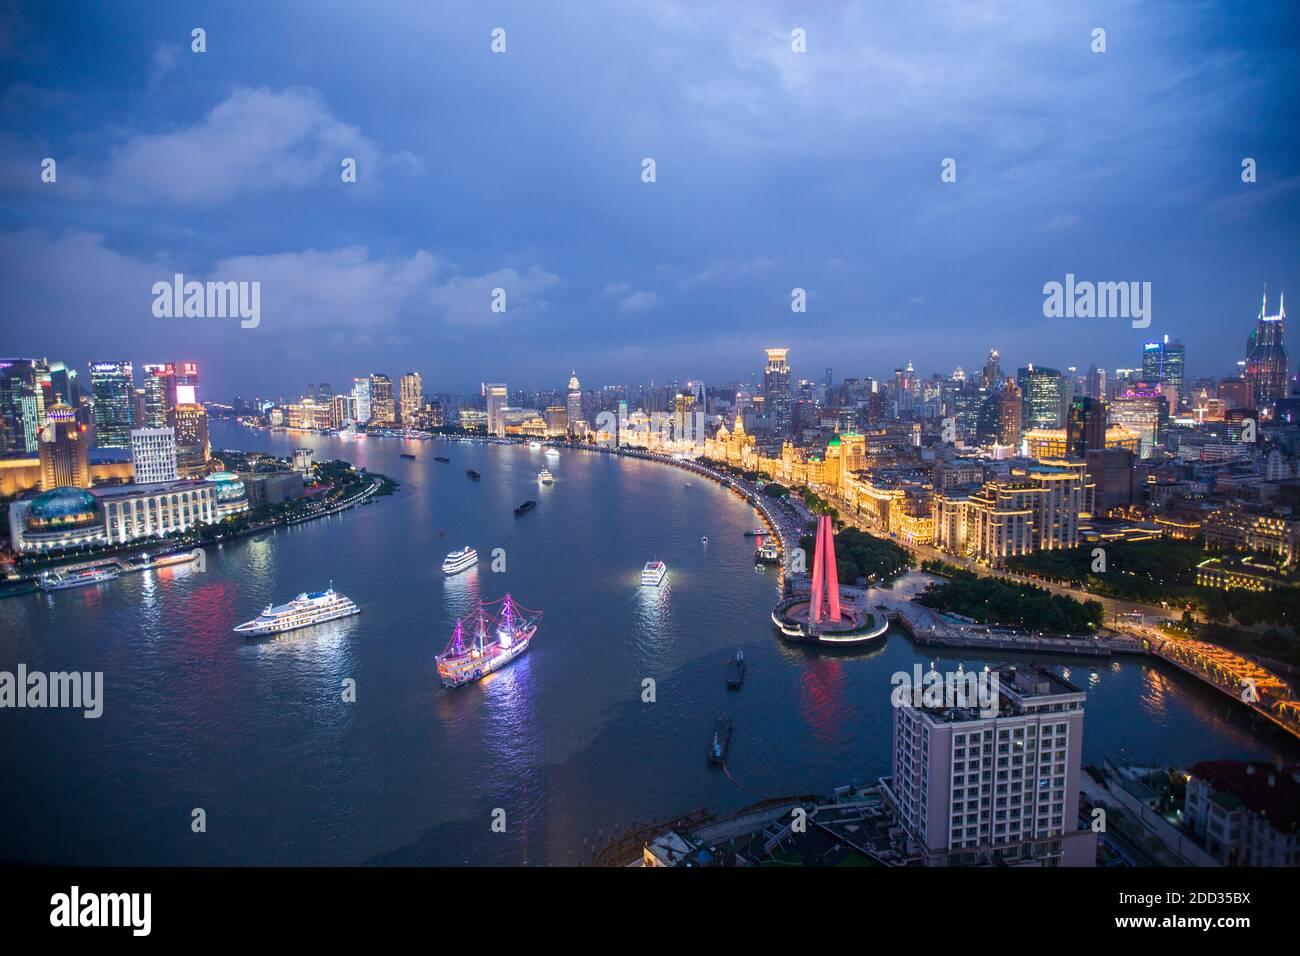 Shanghai urban construction scenery at night Stock Photo